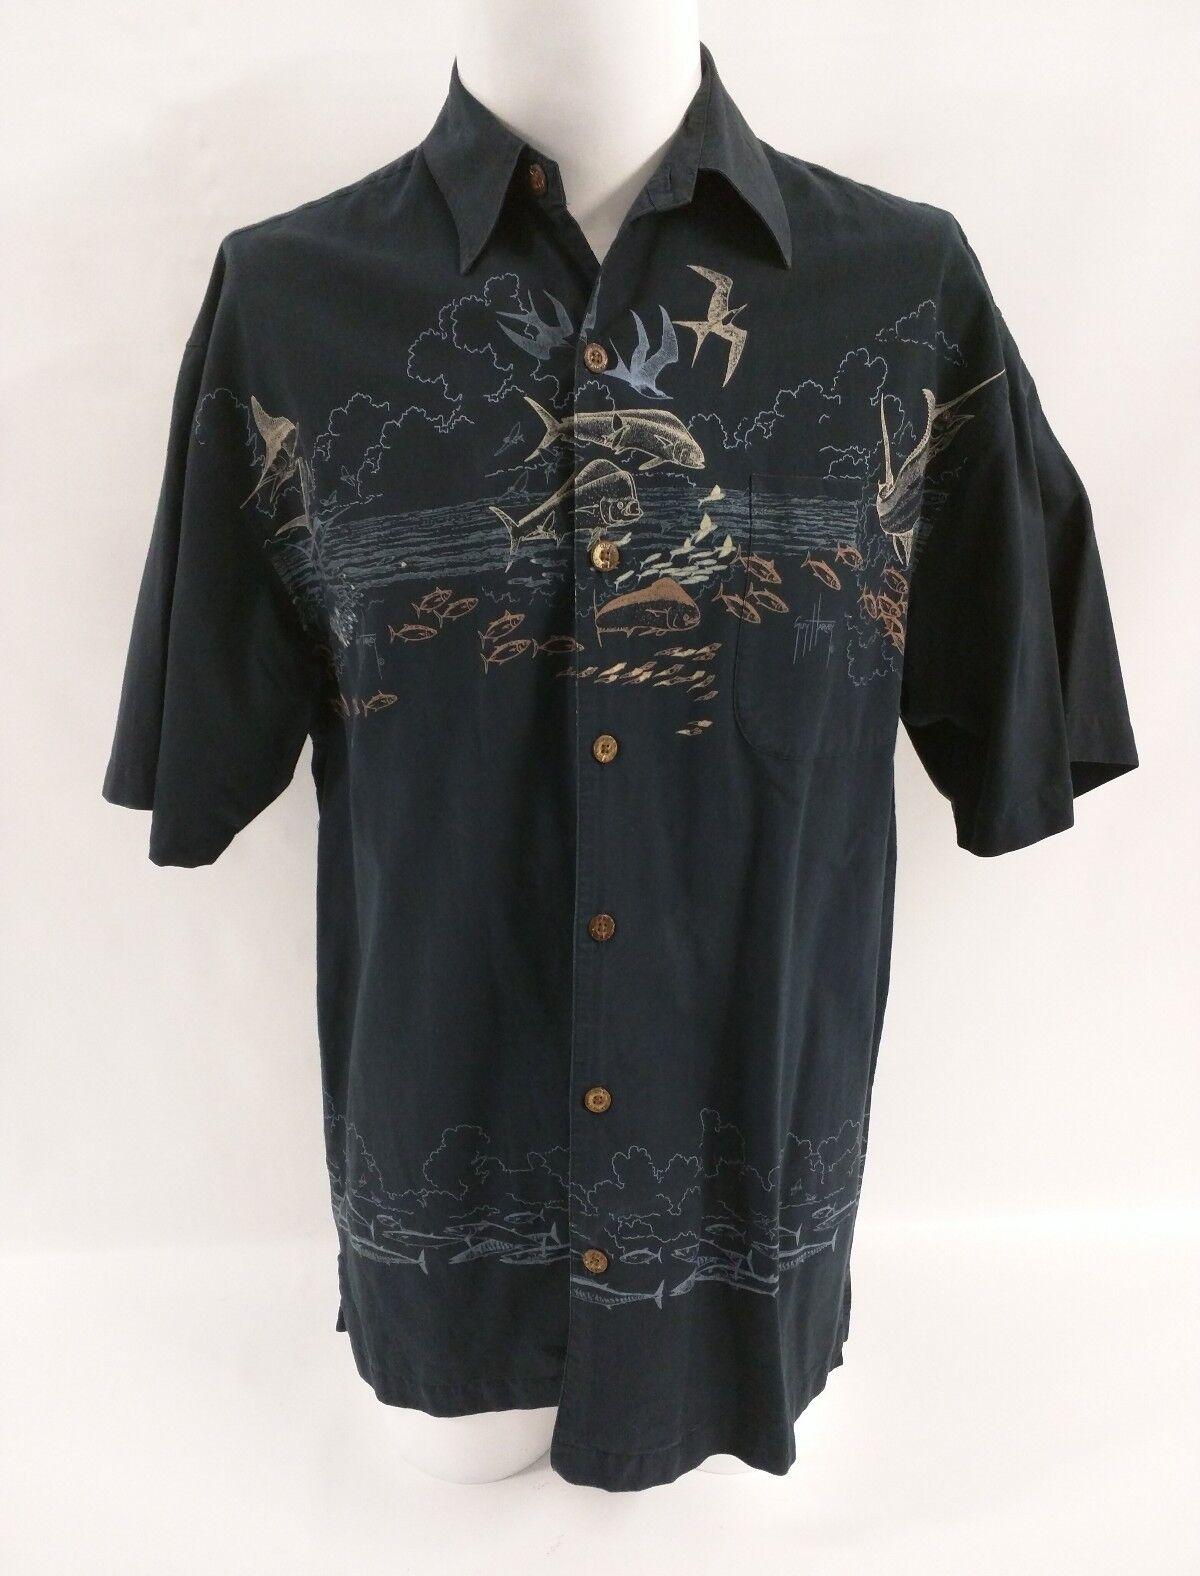 GUY HARVEY bluee orange Marlin Fish Ocean Scene Short Sleeve Shirt Men's Medium